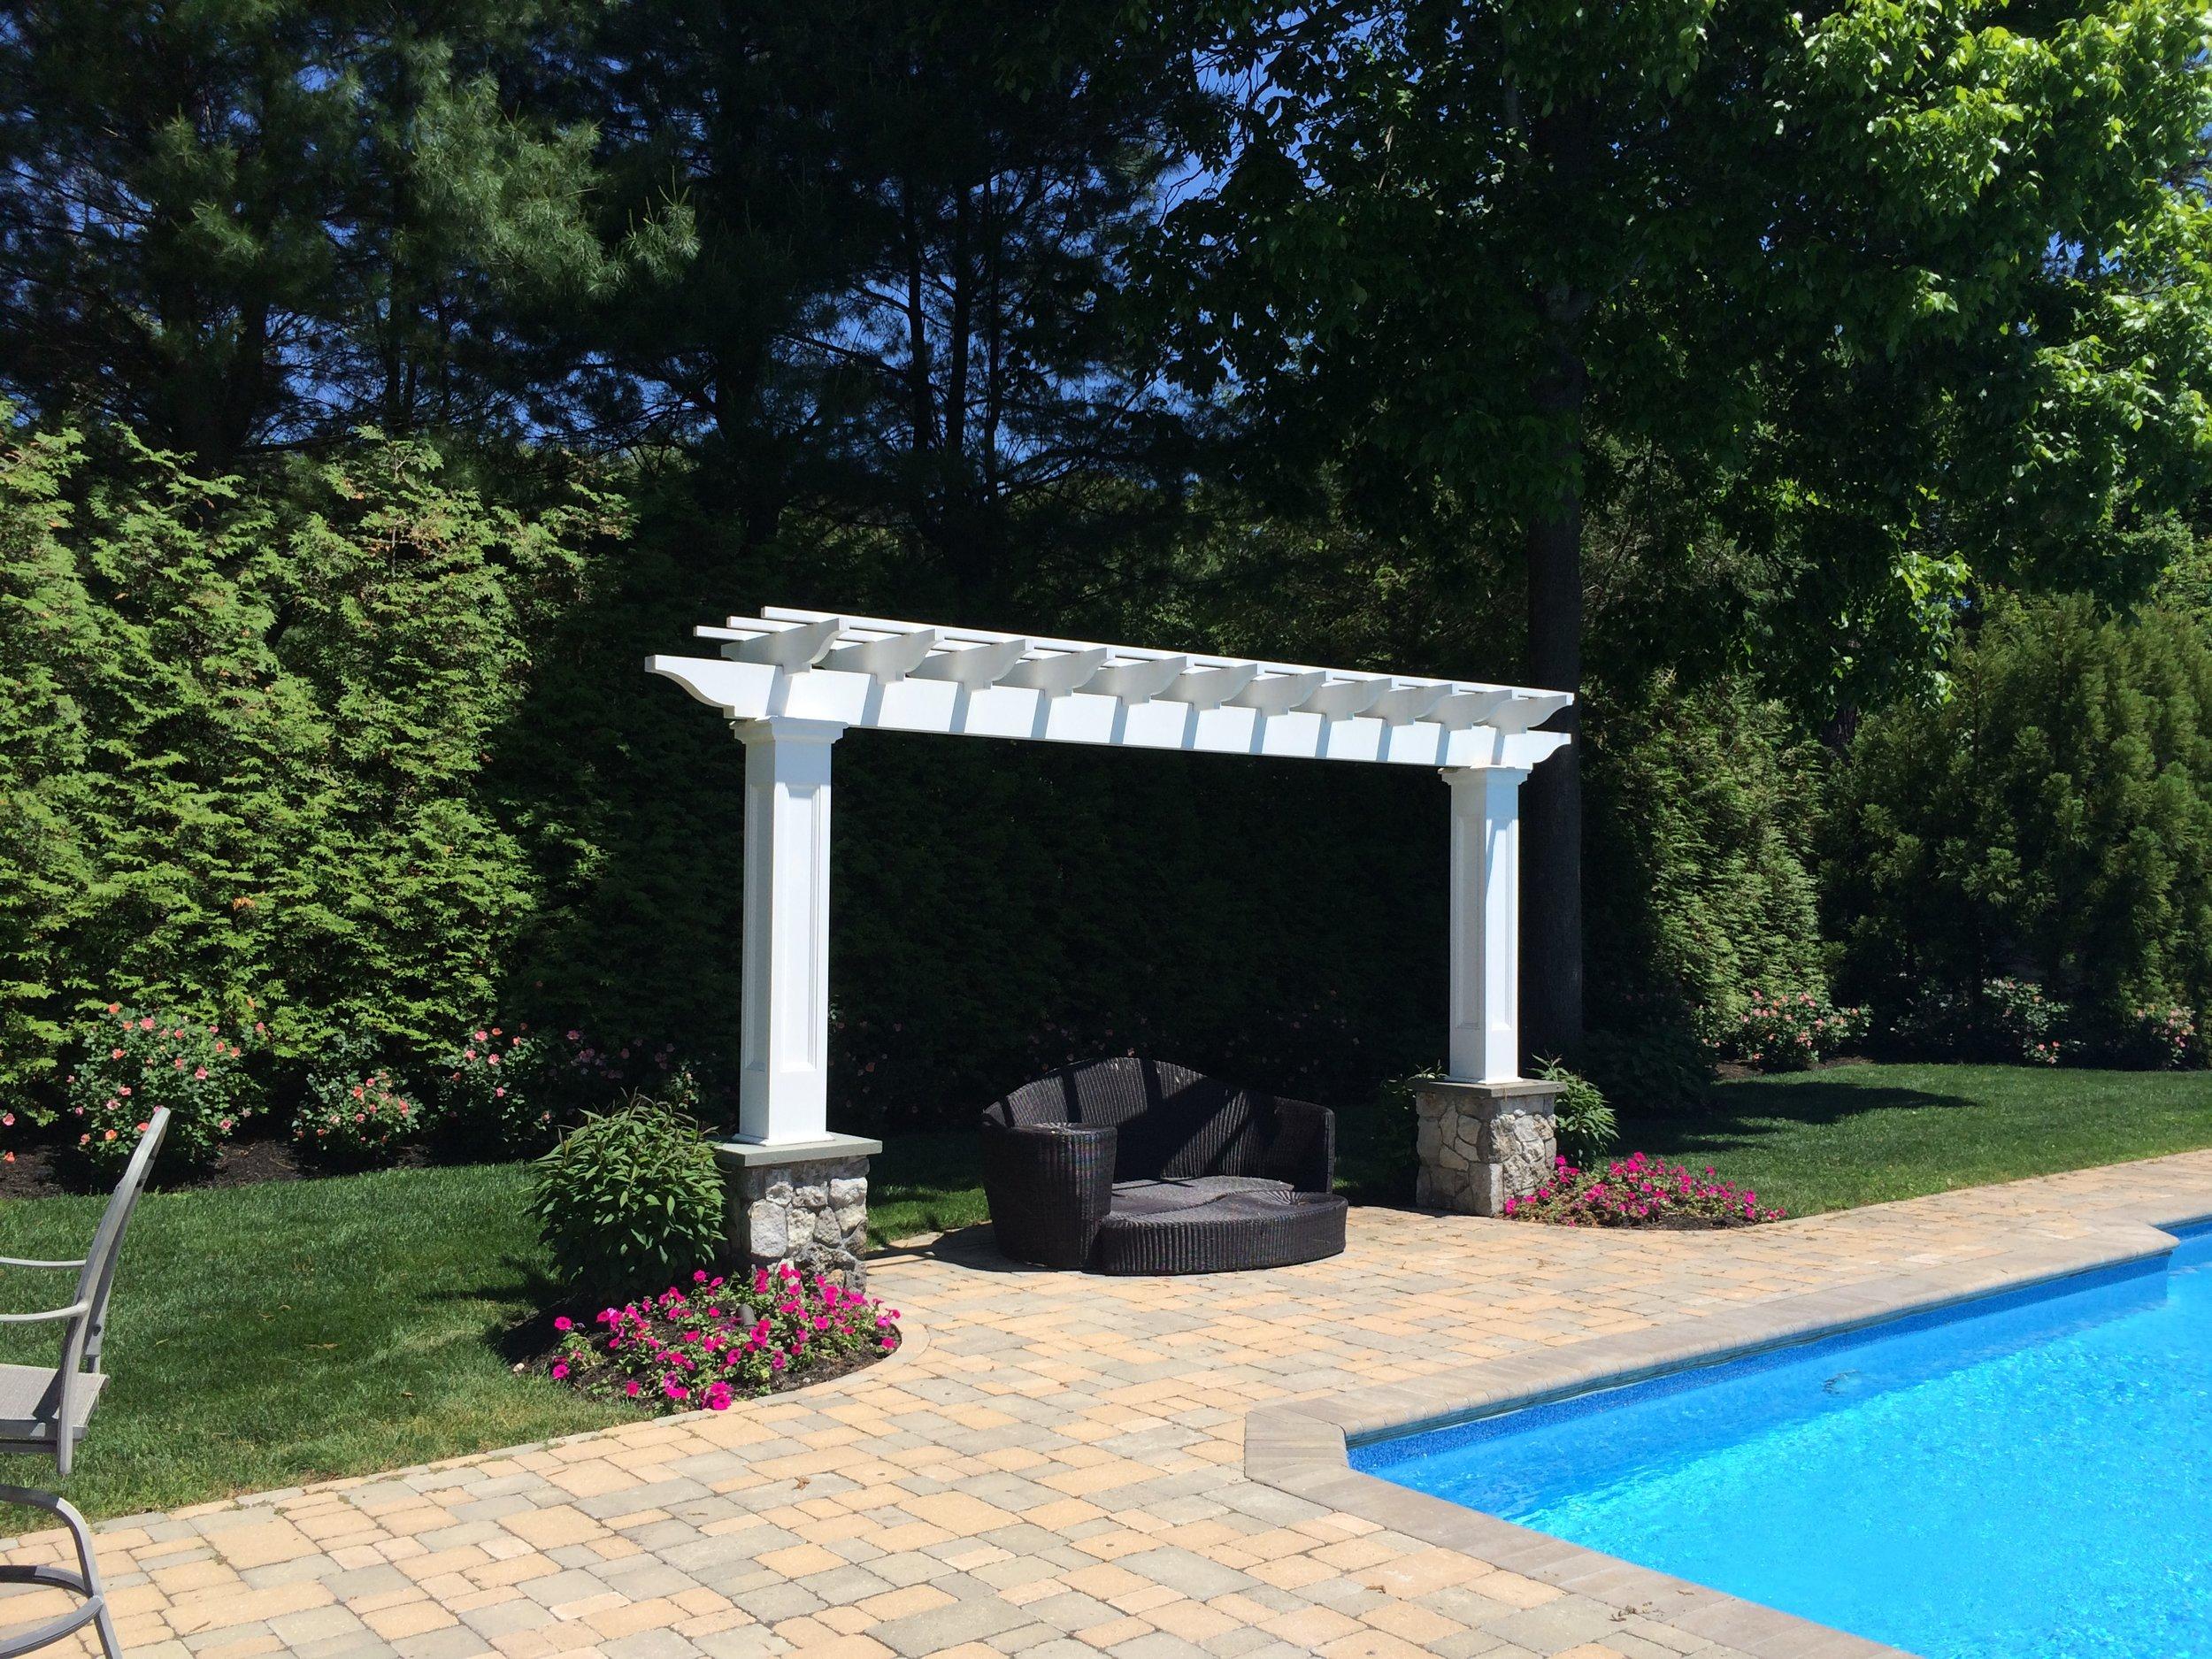 Professional cabana landscape design company in Long Island, NY